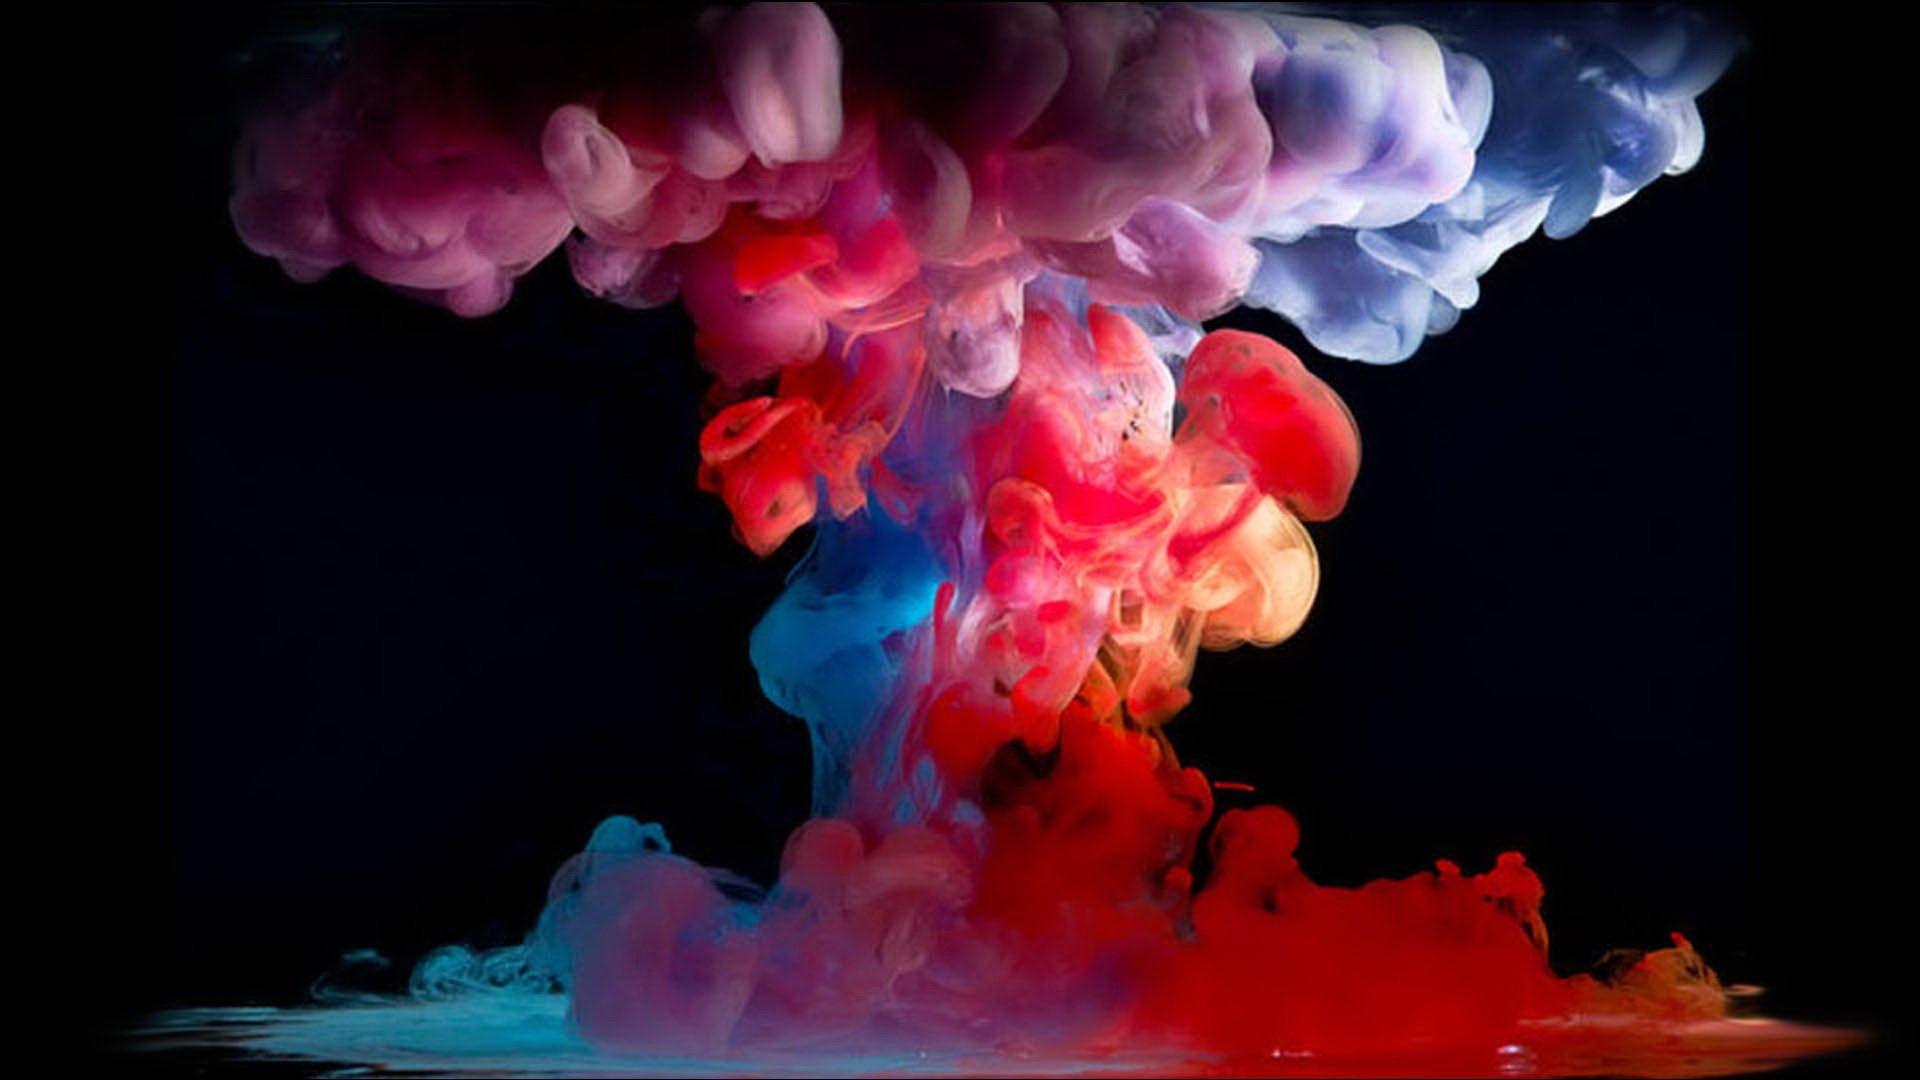 Abstract - Smoke  Wallpaper